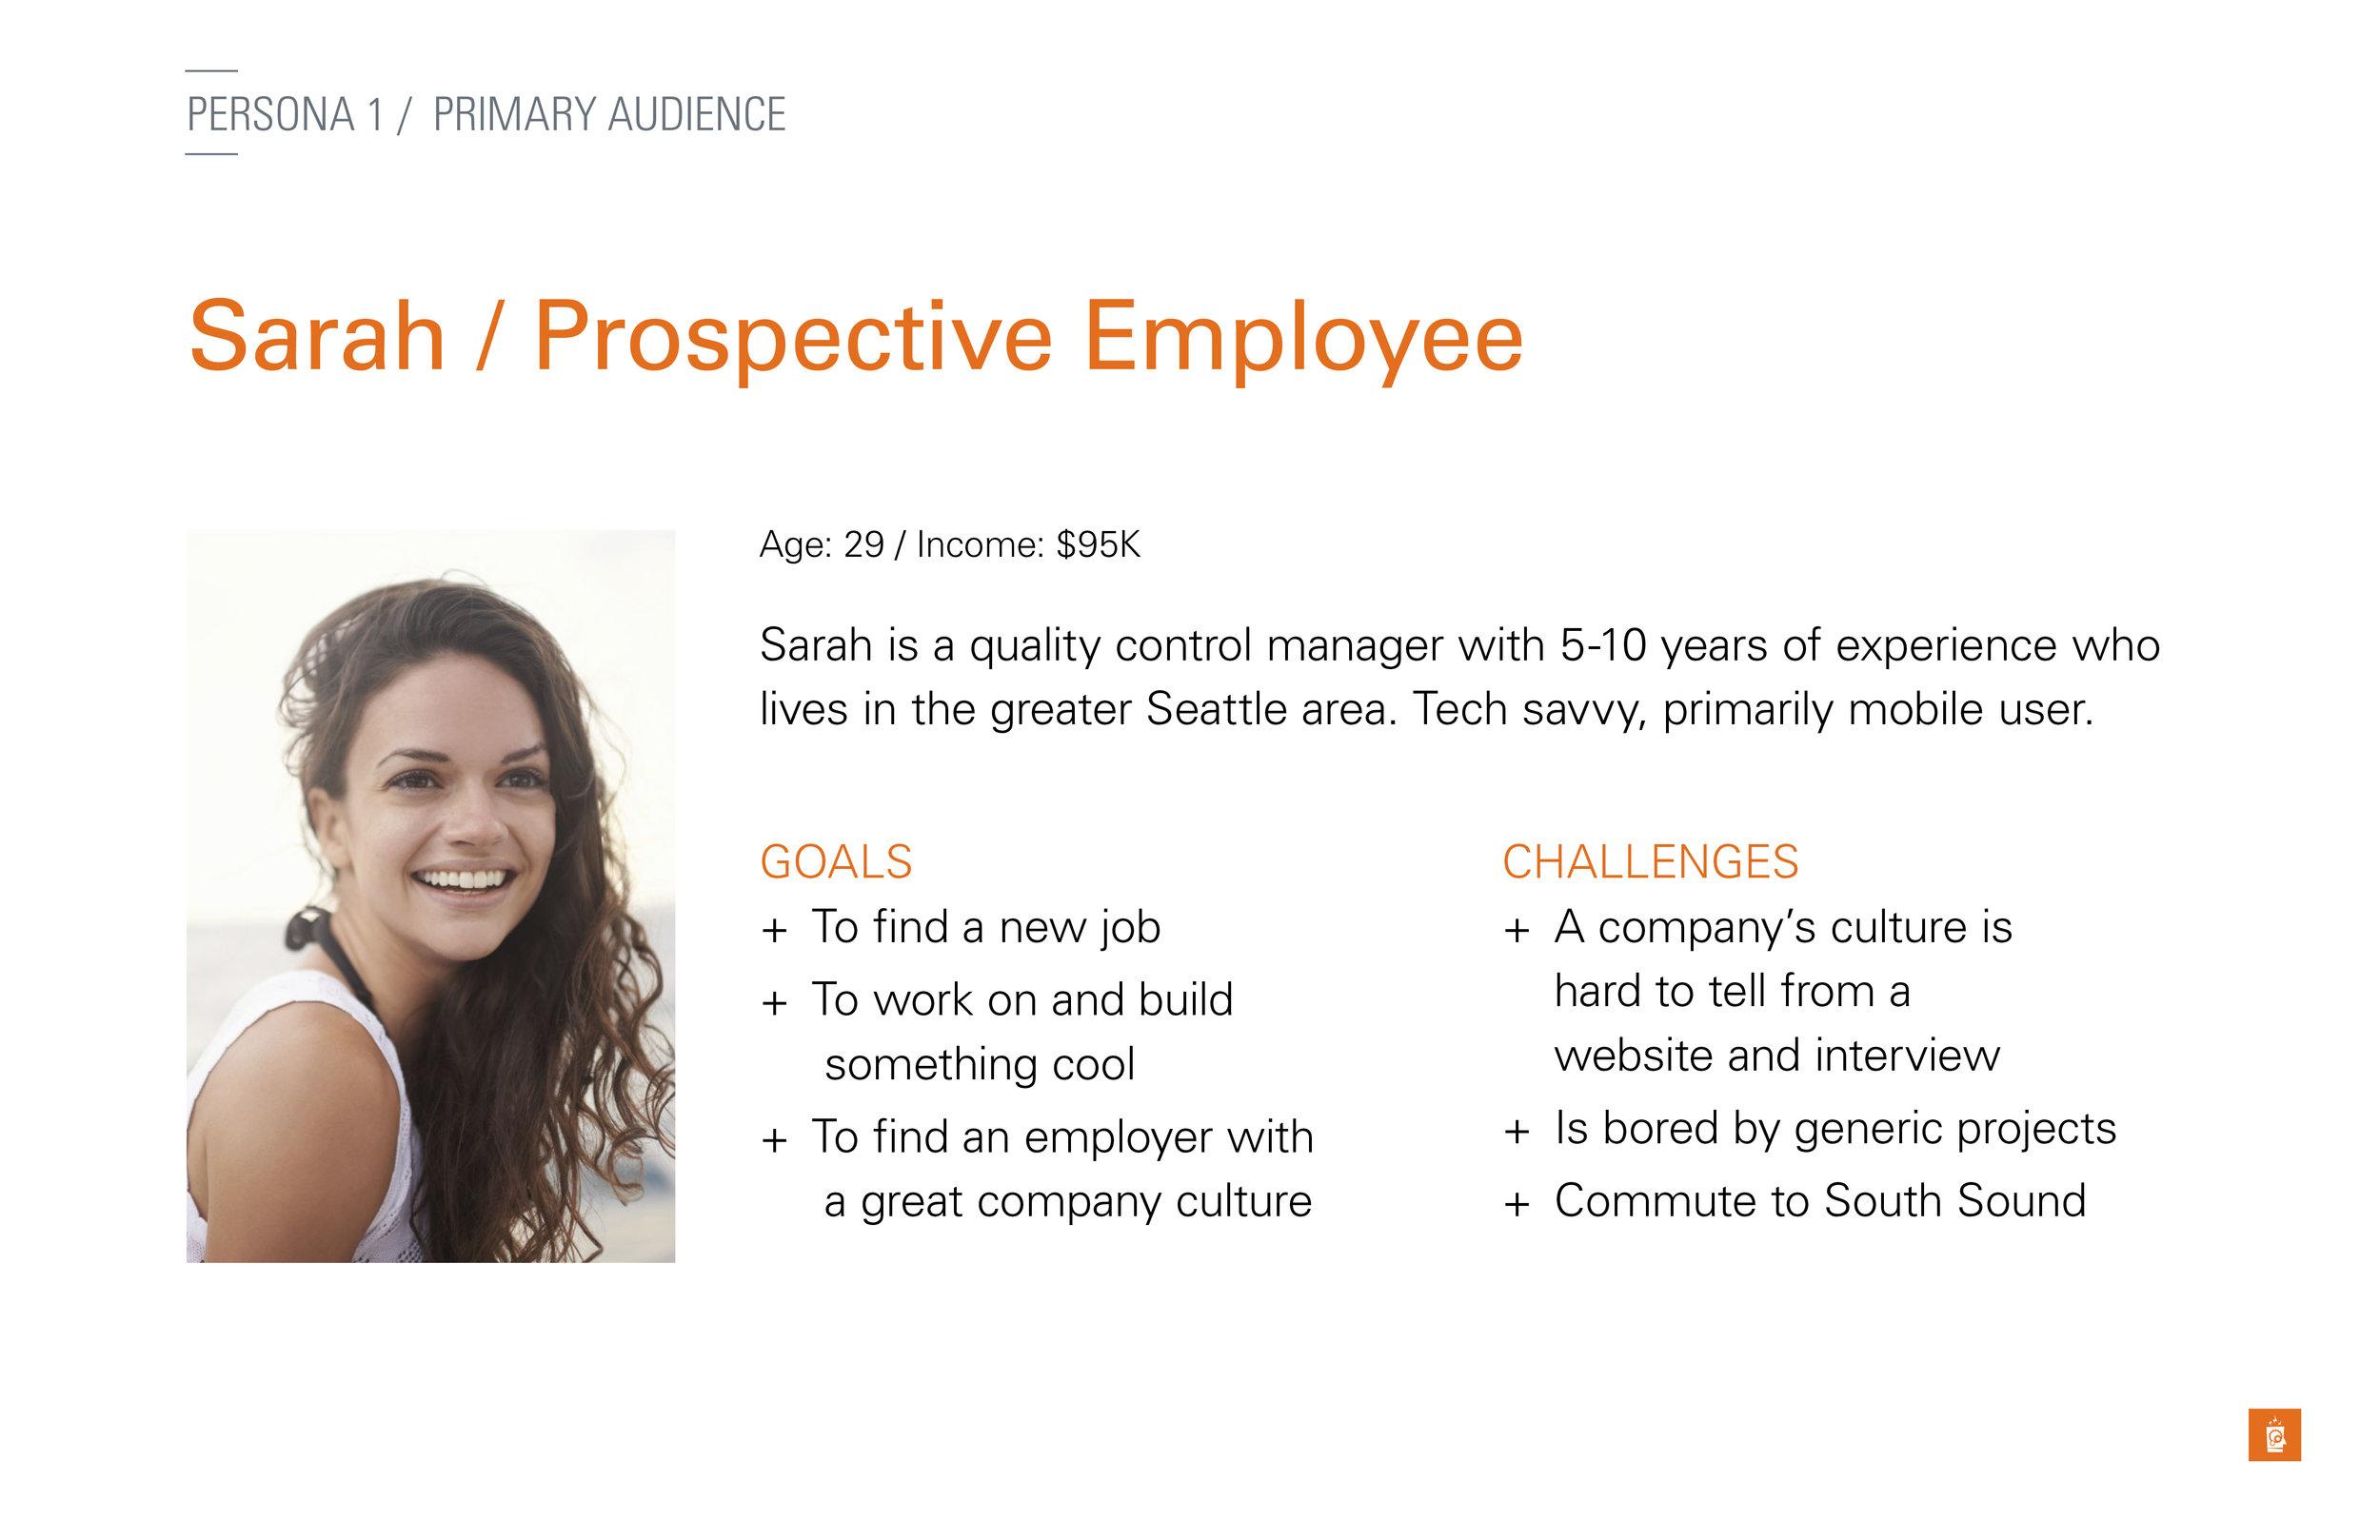 Sarah, the Prospective Employee persona